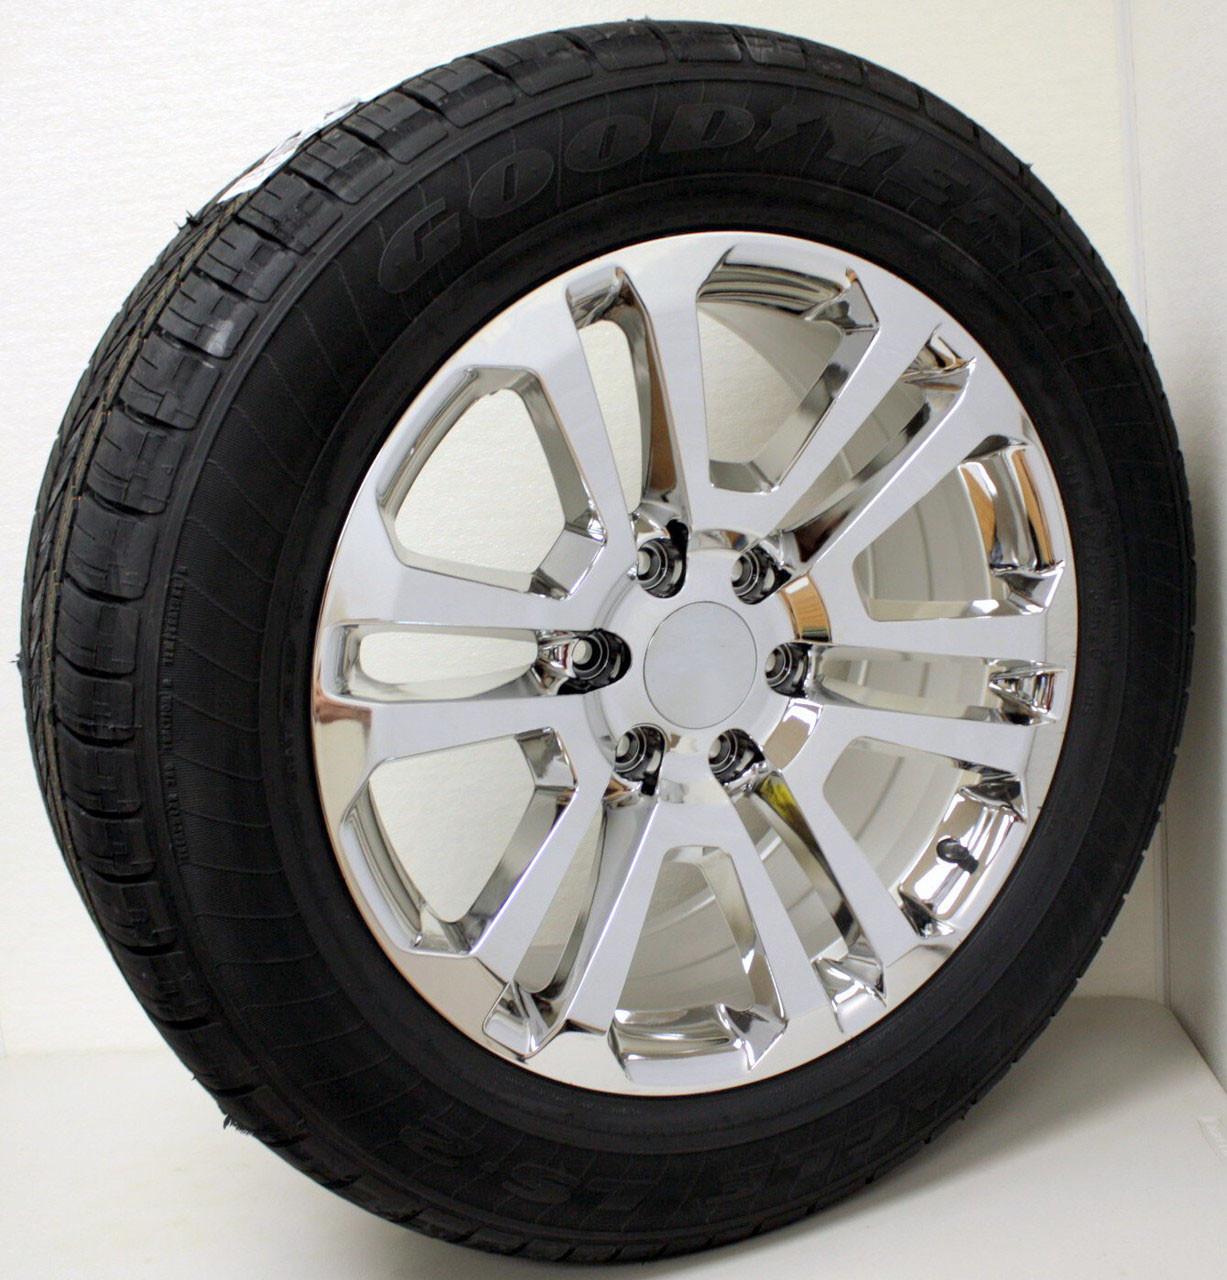 "Chrome 20"" Split Spoke Wheels with Goodyear Tires for Chevy Silverado, Tahoe, Suburban - New Set of 4"